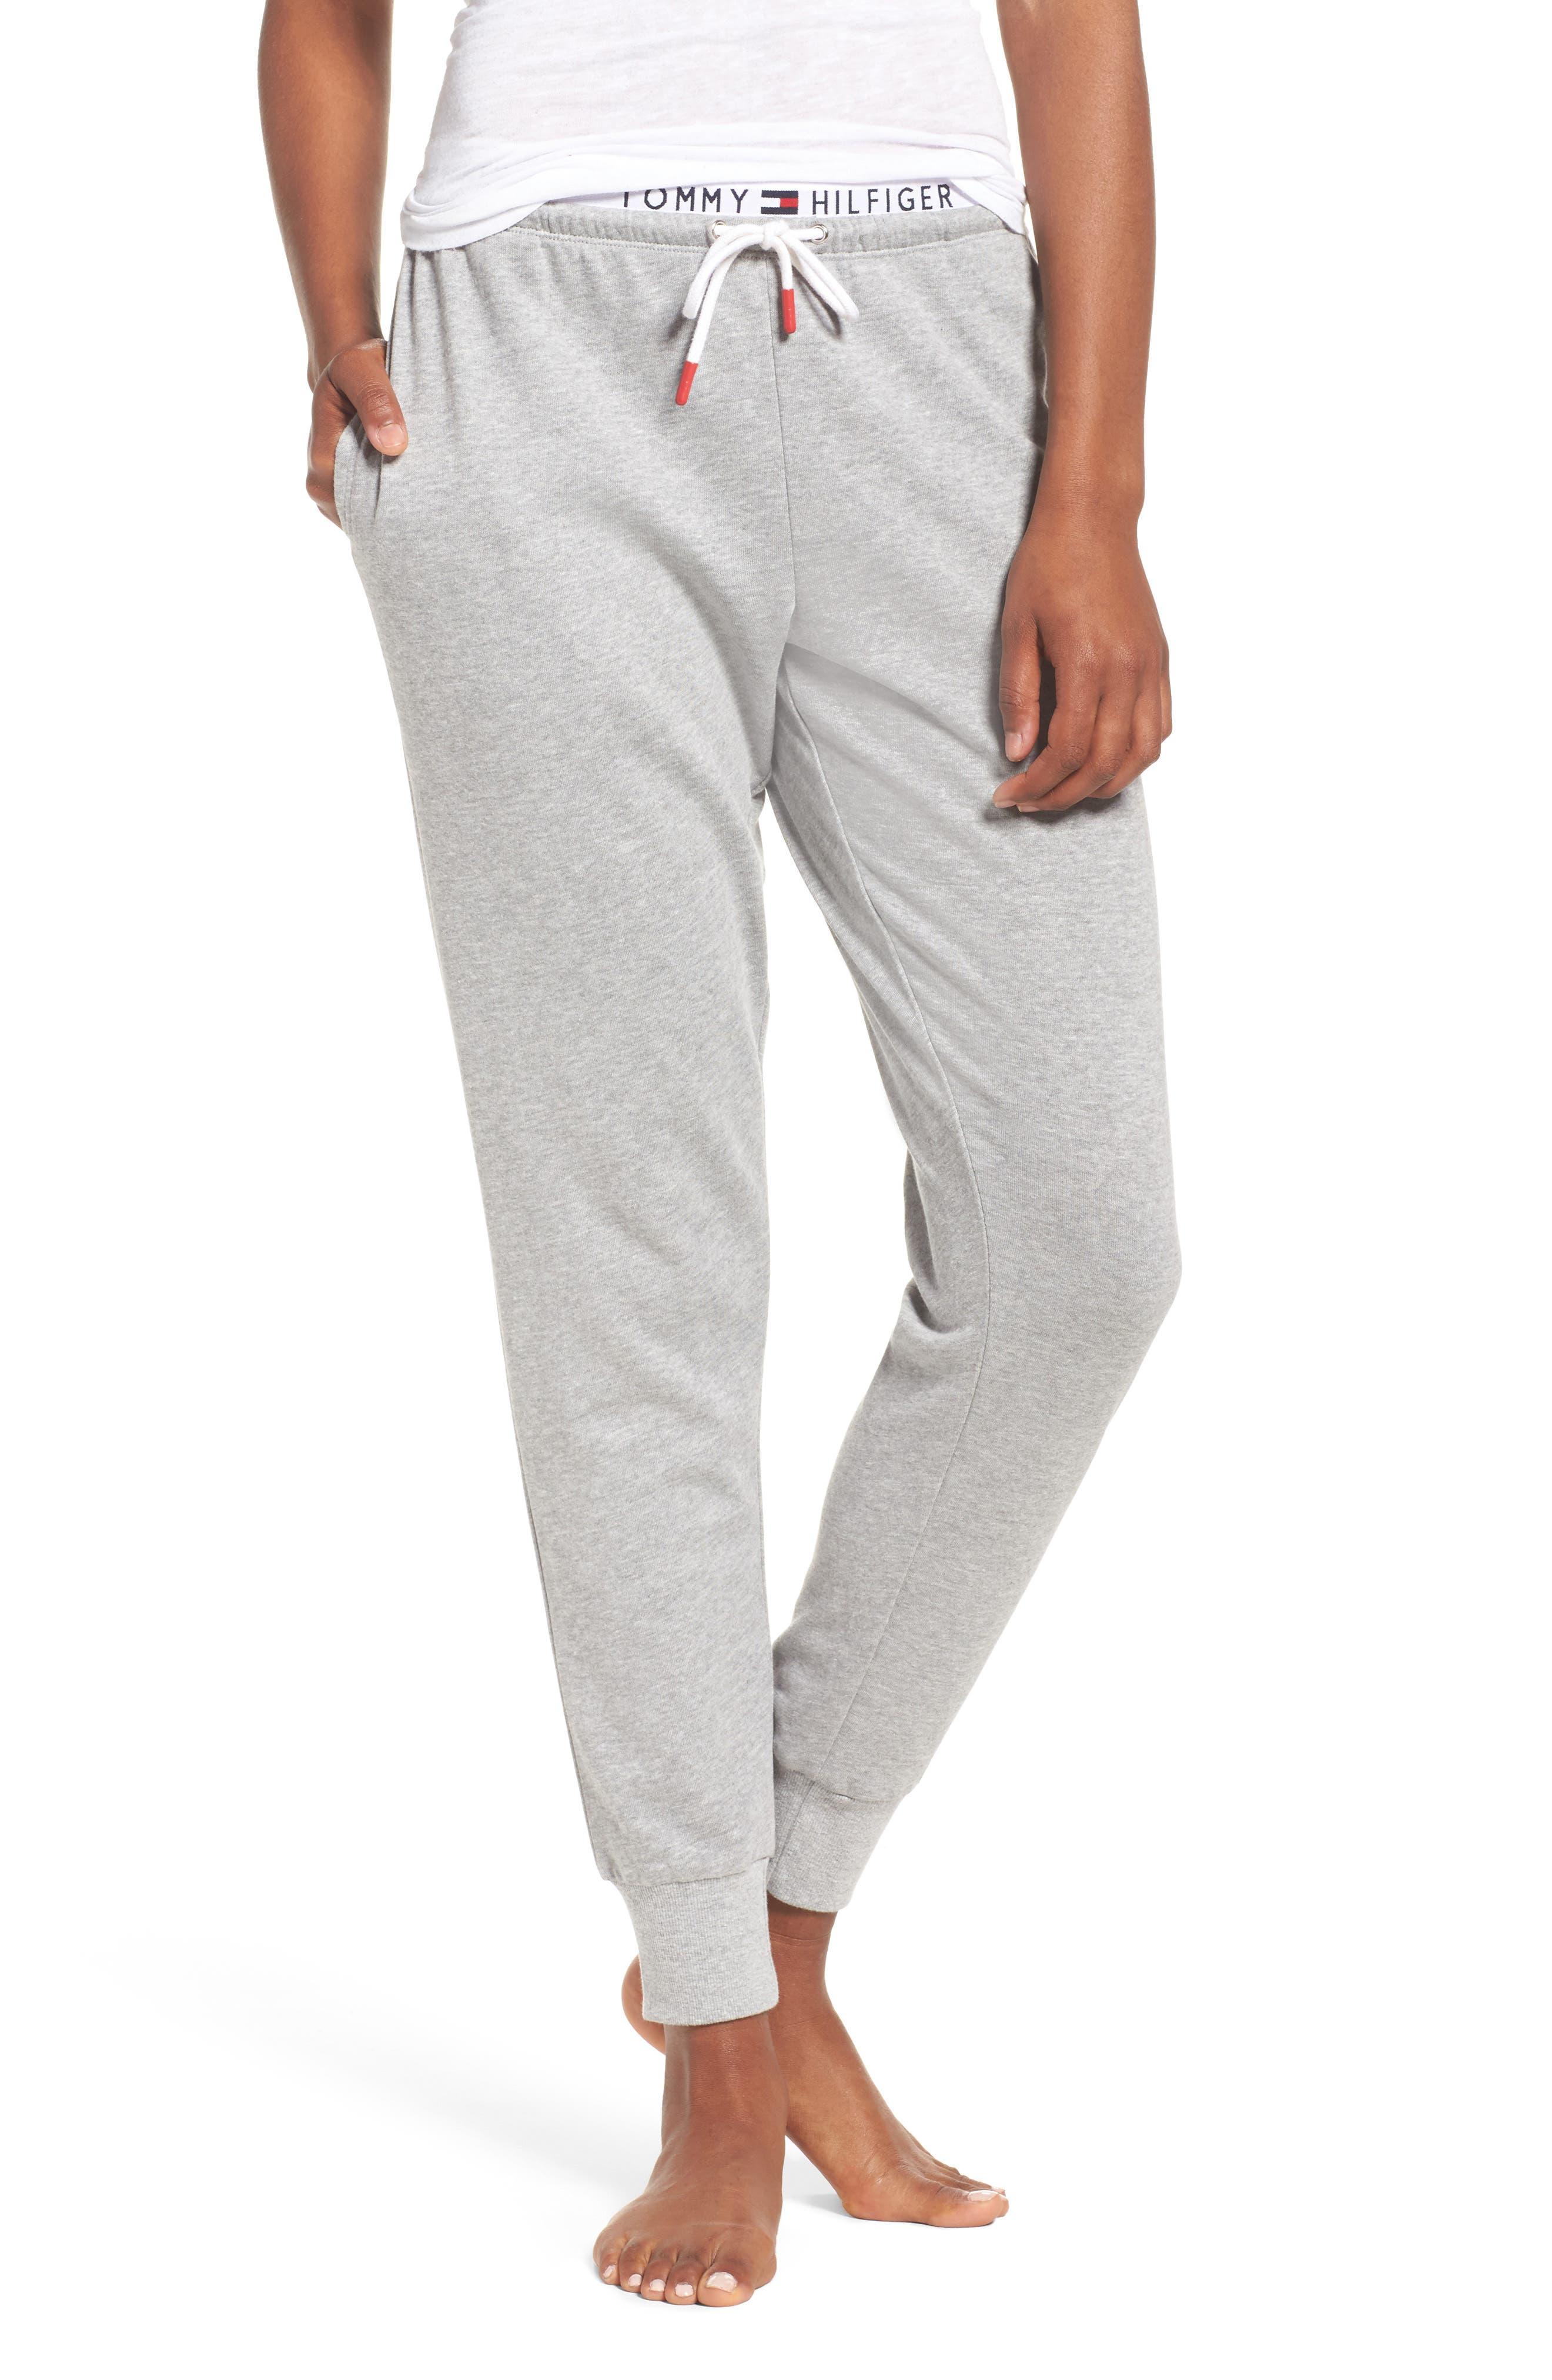 Retro Jogger Pants,                         Main,                         color, 020